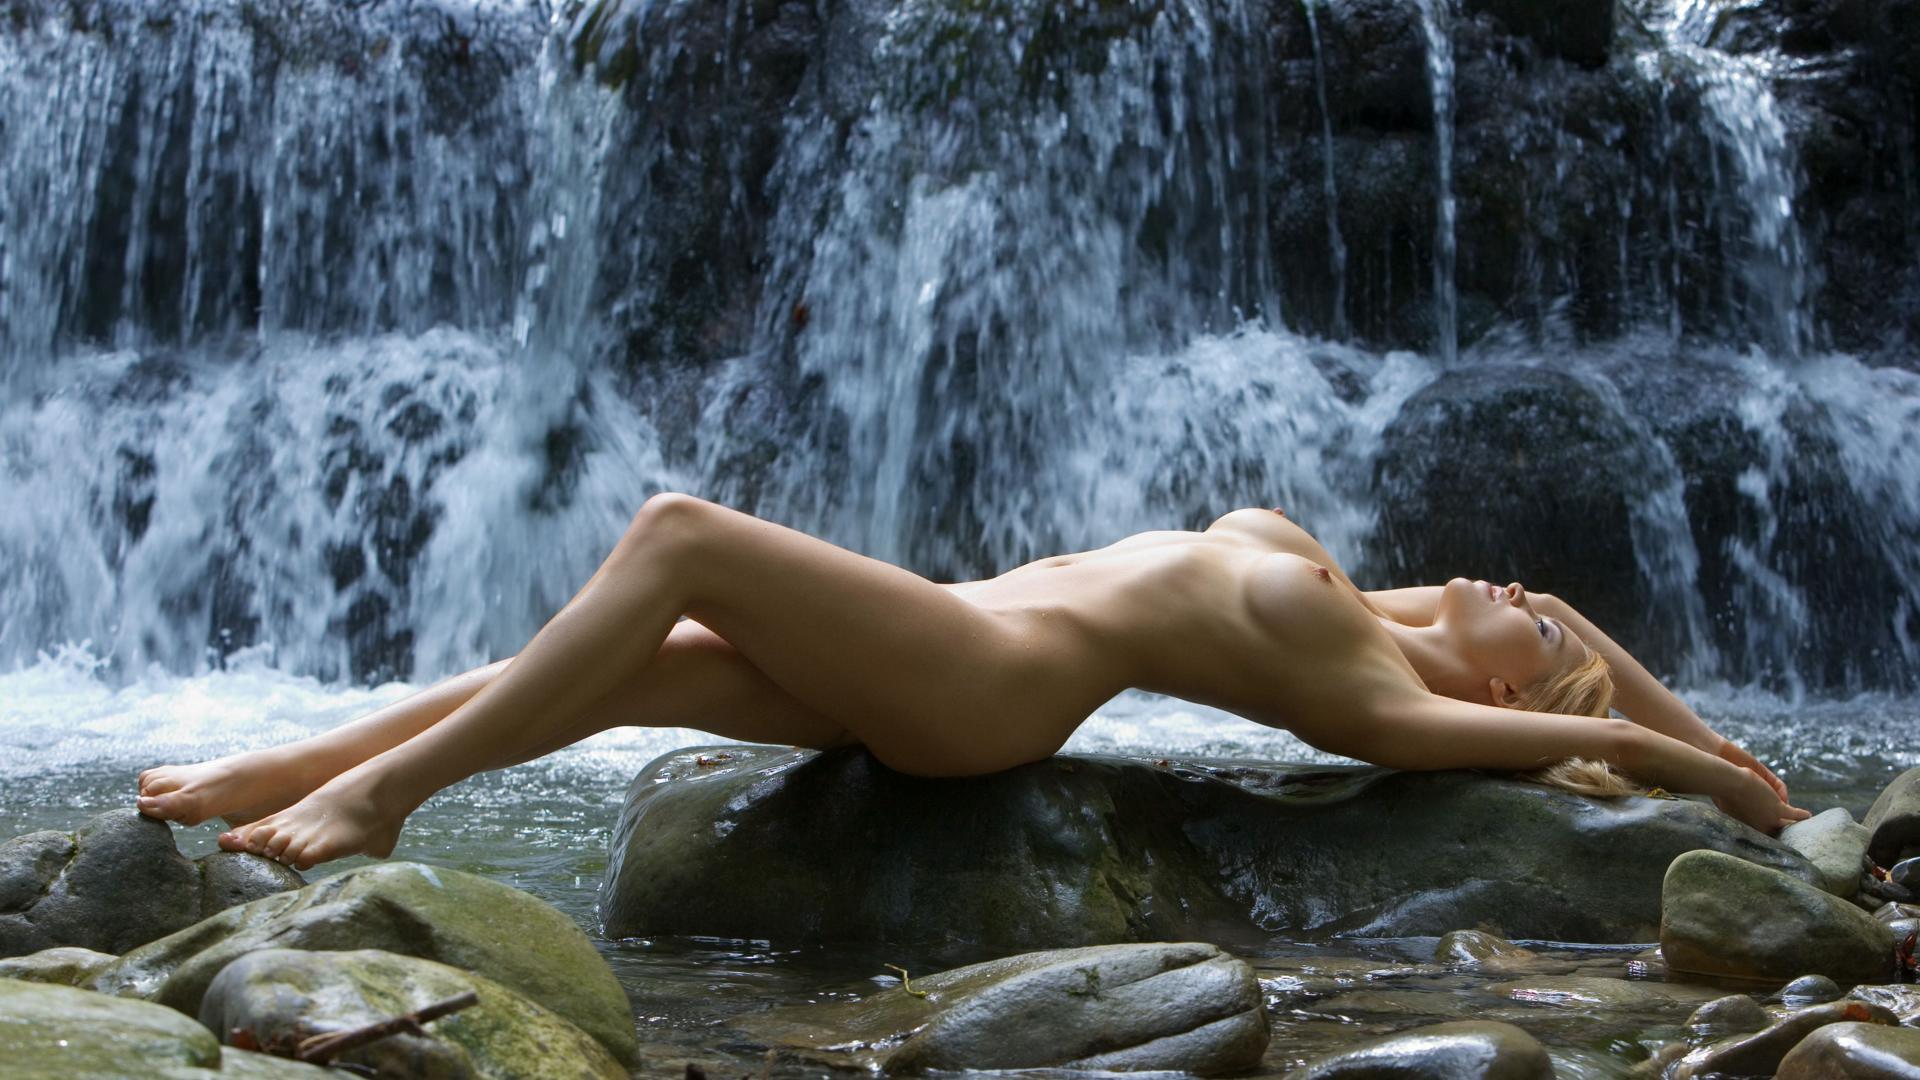 Lia may nude wallpaper 1920 x 1080 ready